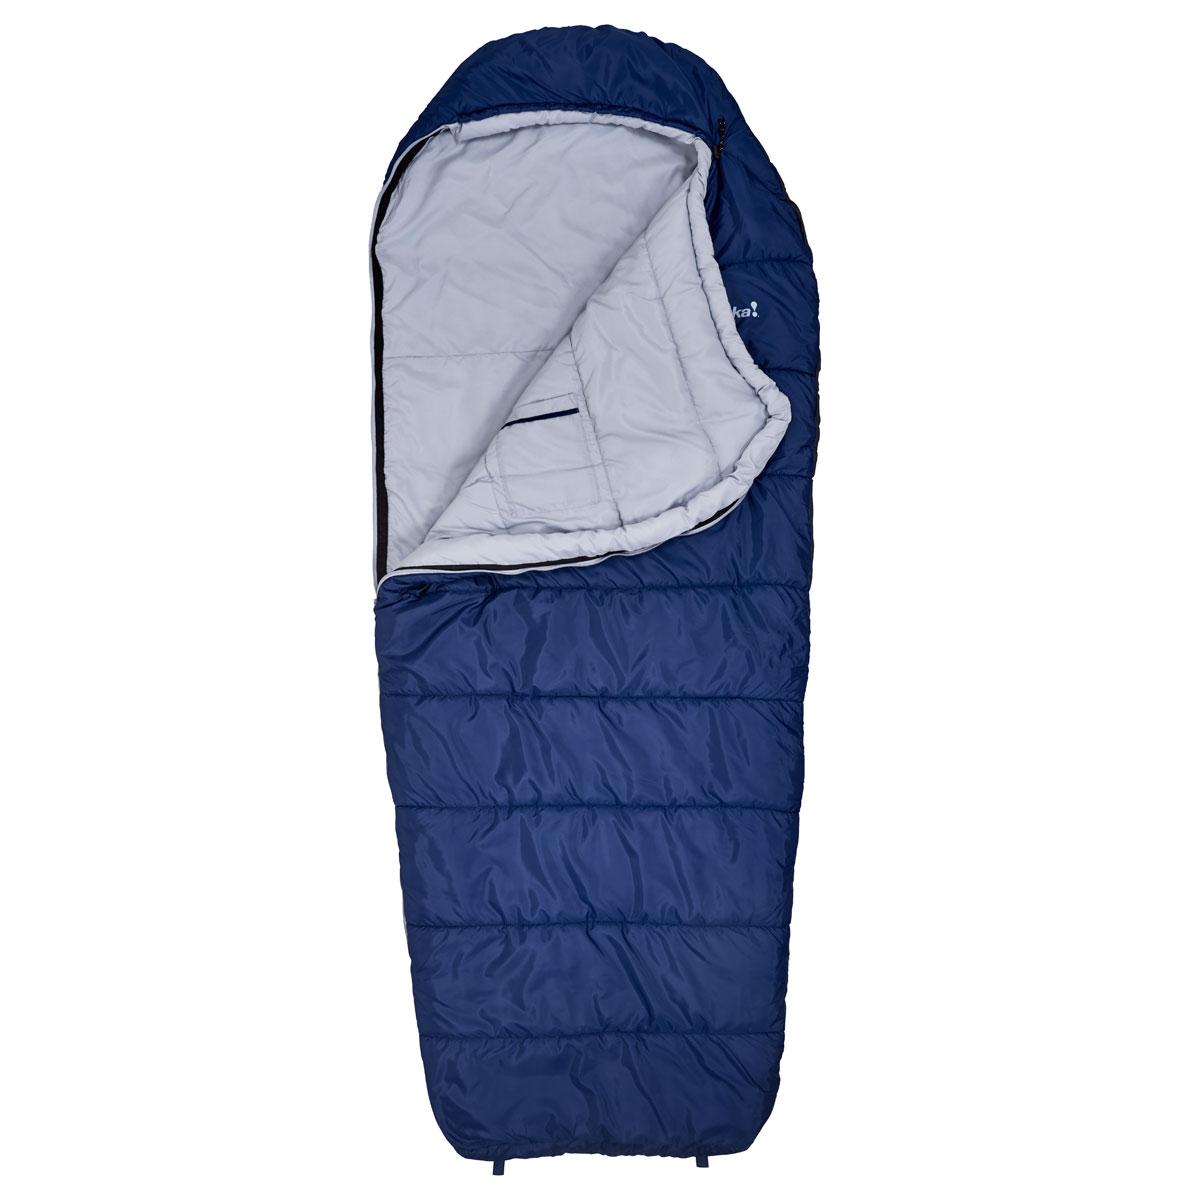 Eureka! Lone Pine 30 Degree Sleeping Bag - Wildland Warehouse | Gear for Wildland Fire